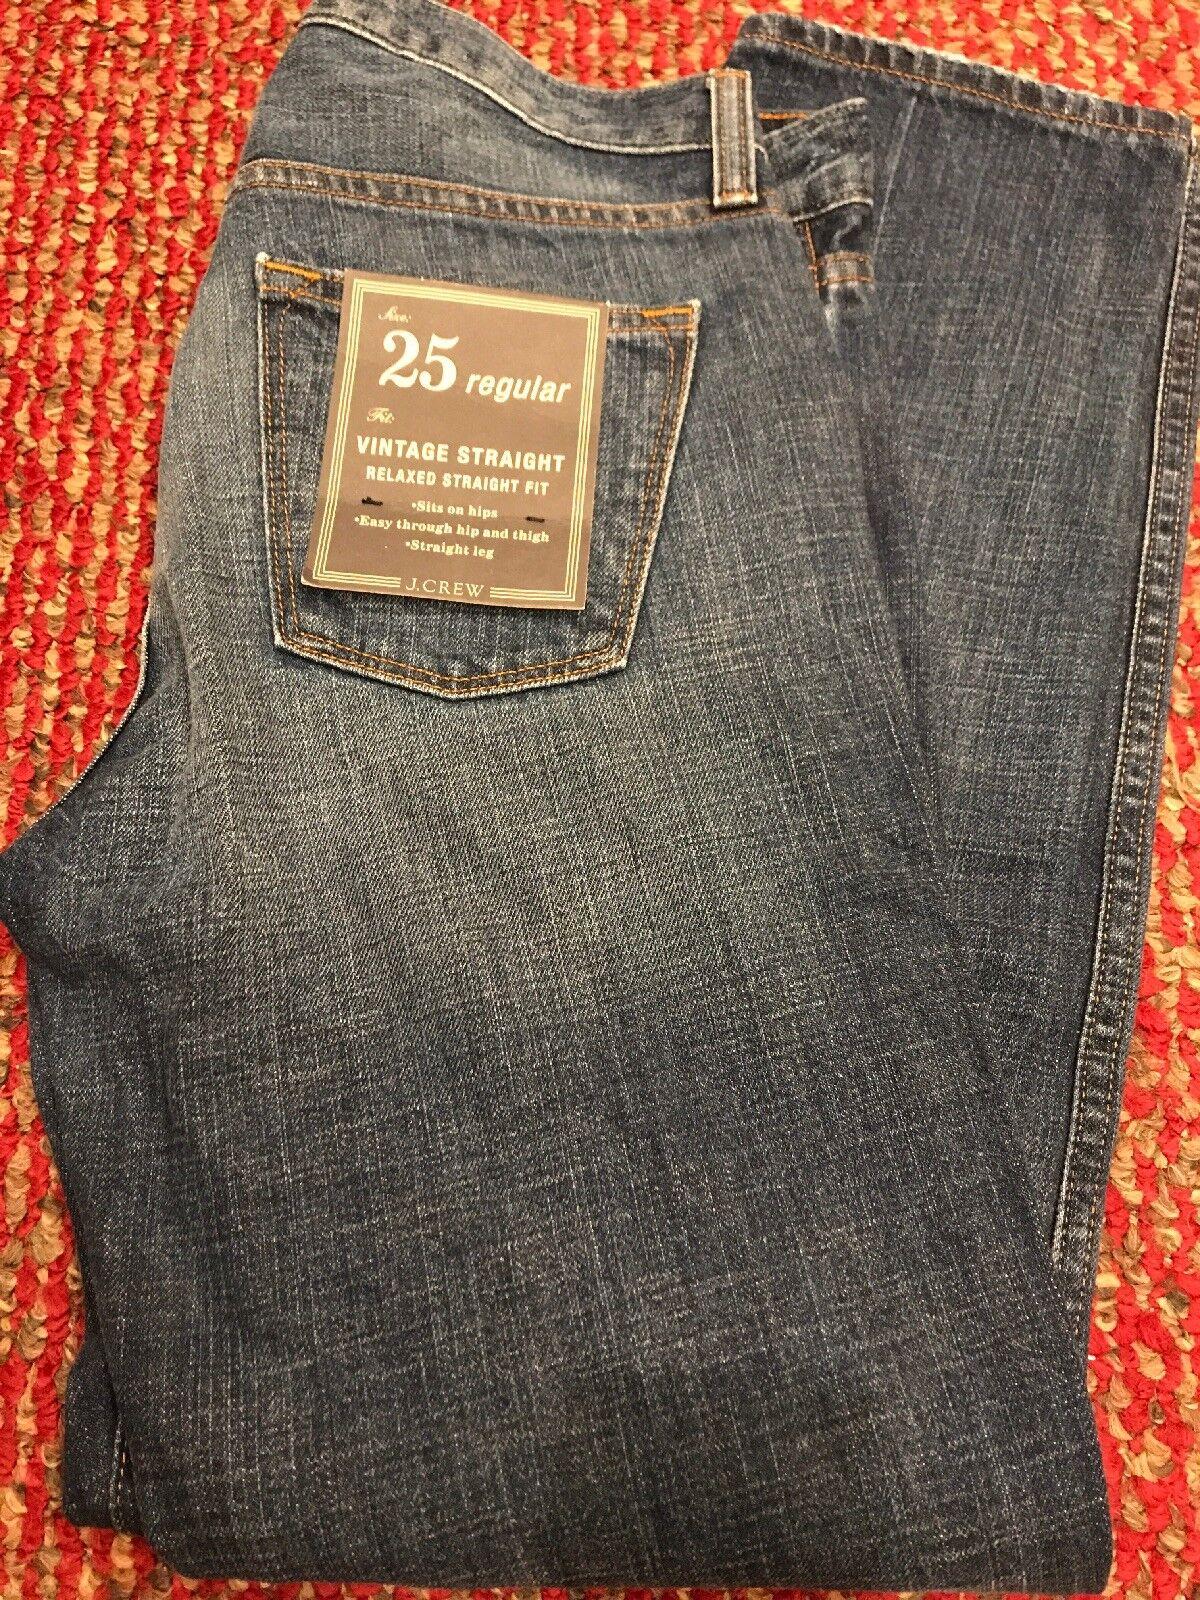 J.Girocollo Vintage Dritto Morbido Morbido Morbido Jeans, da Donna, Taglia 25 Regular, 3005cf